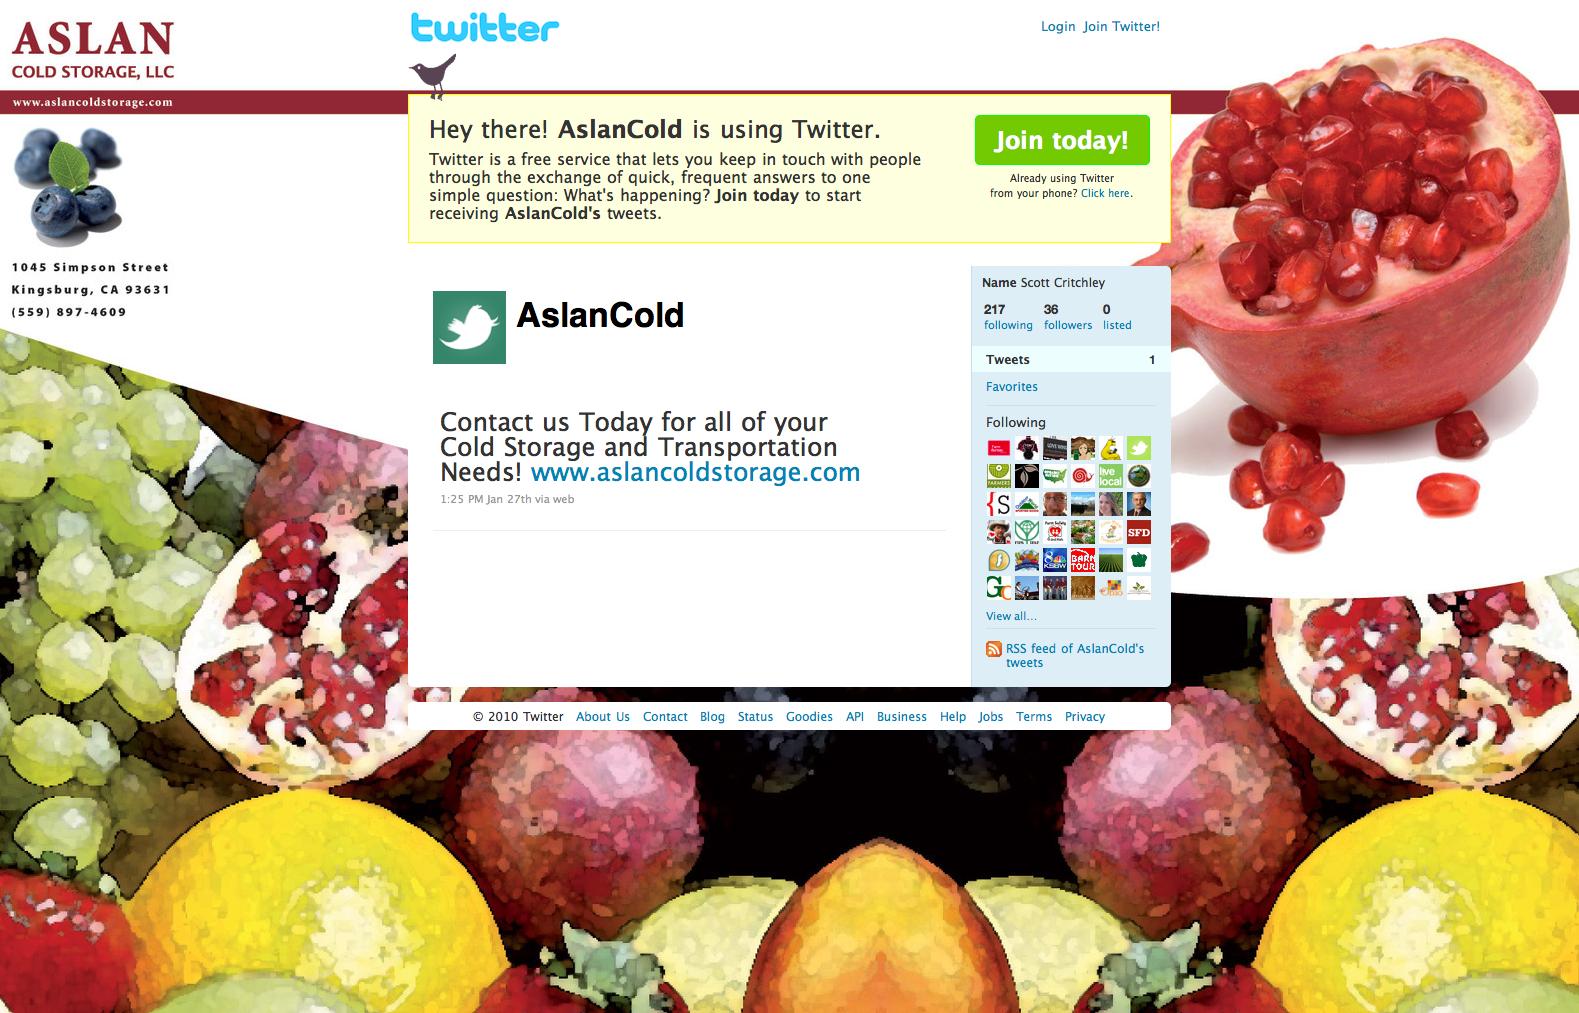 Aslan Cold Storage Custom Twitter Background Design by MC Solutions  sc 1 st  Pinterest & Aslan Cold Storage Custom Twitter Background Design by MC Solutions ...